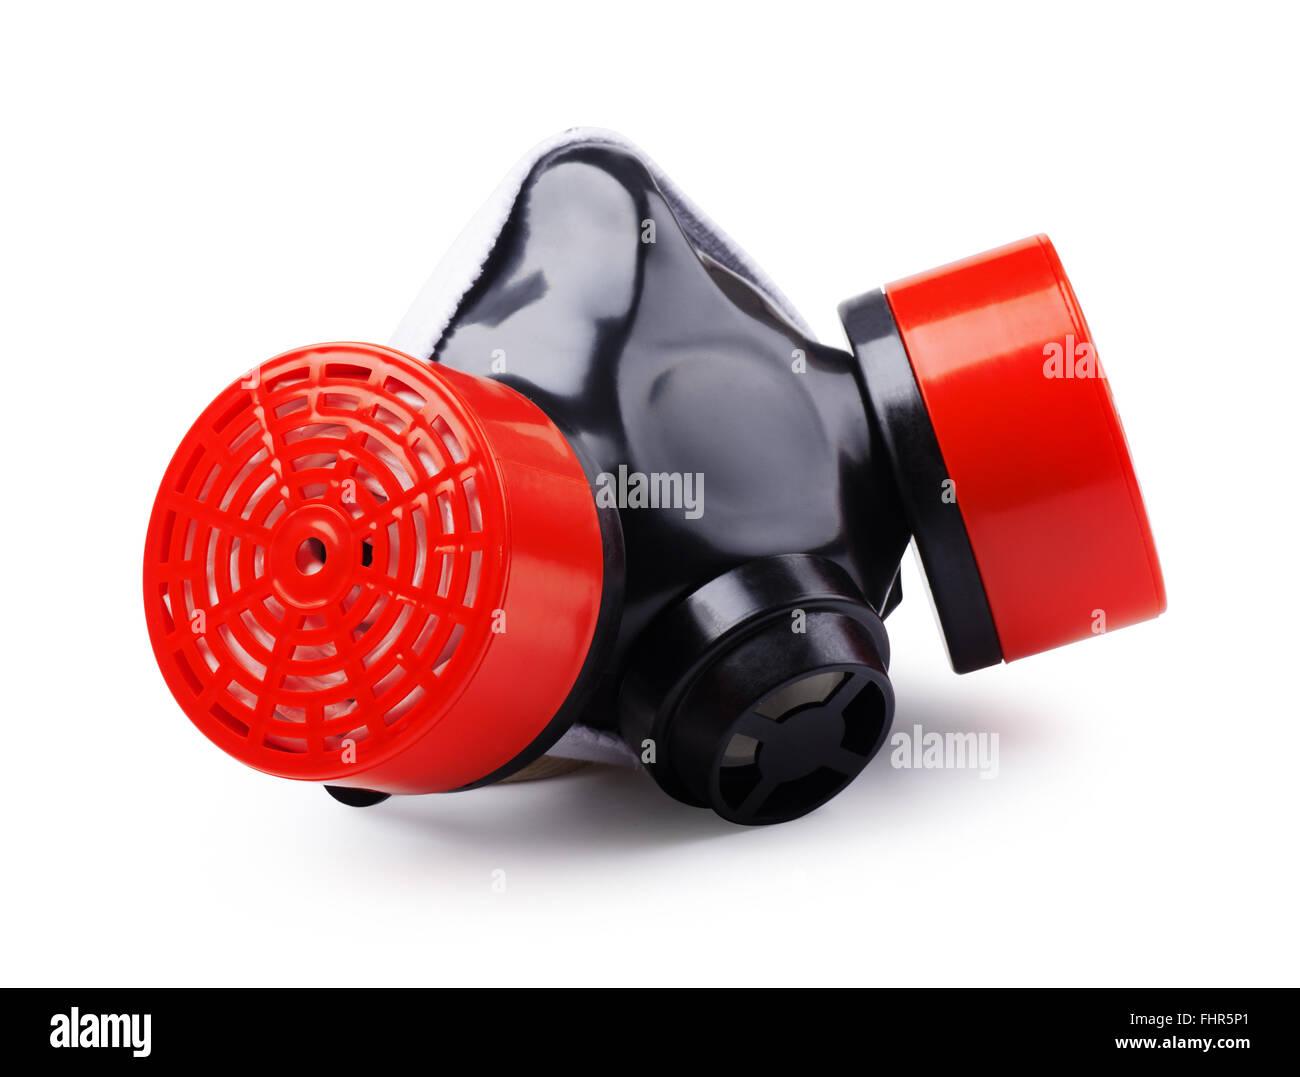 Protective gas mask isolated on white background - Stock Image